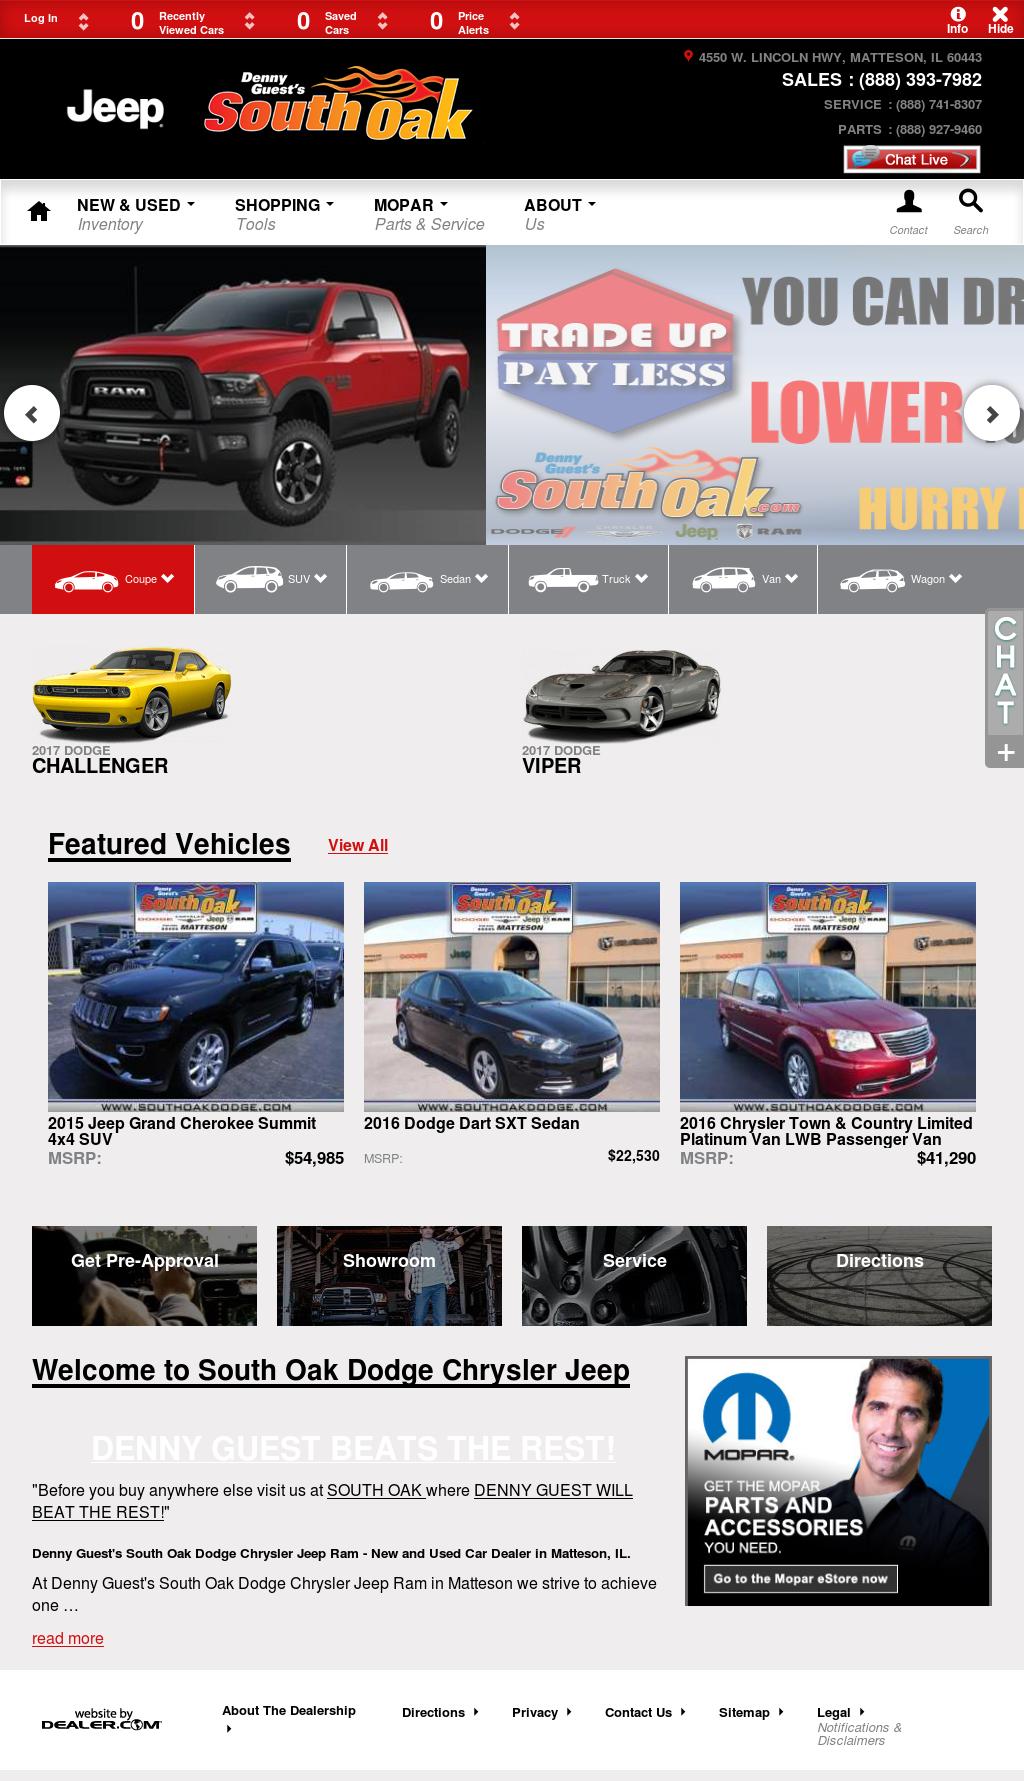 South Oak Dodge Chrysler Jeep Ram Website History